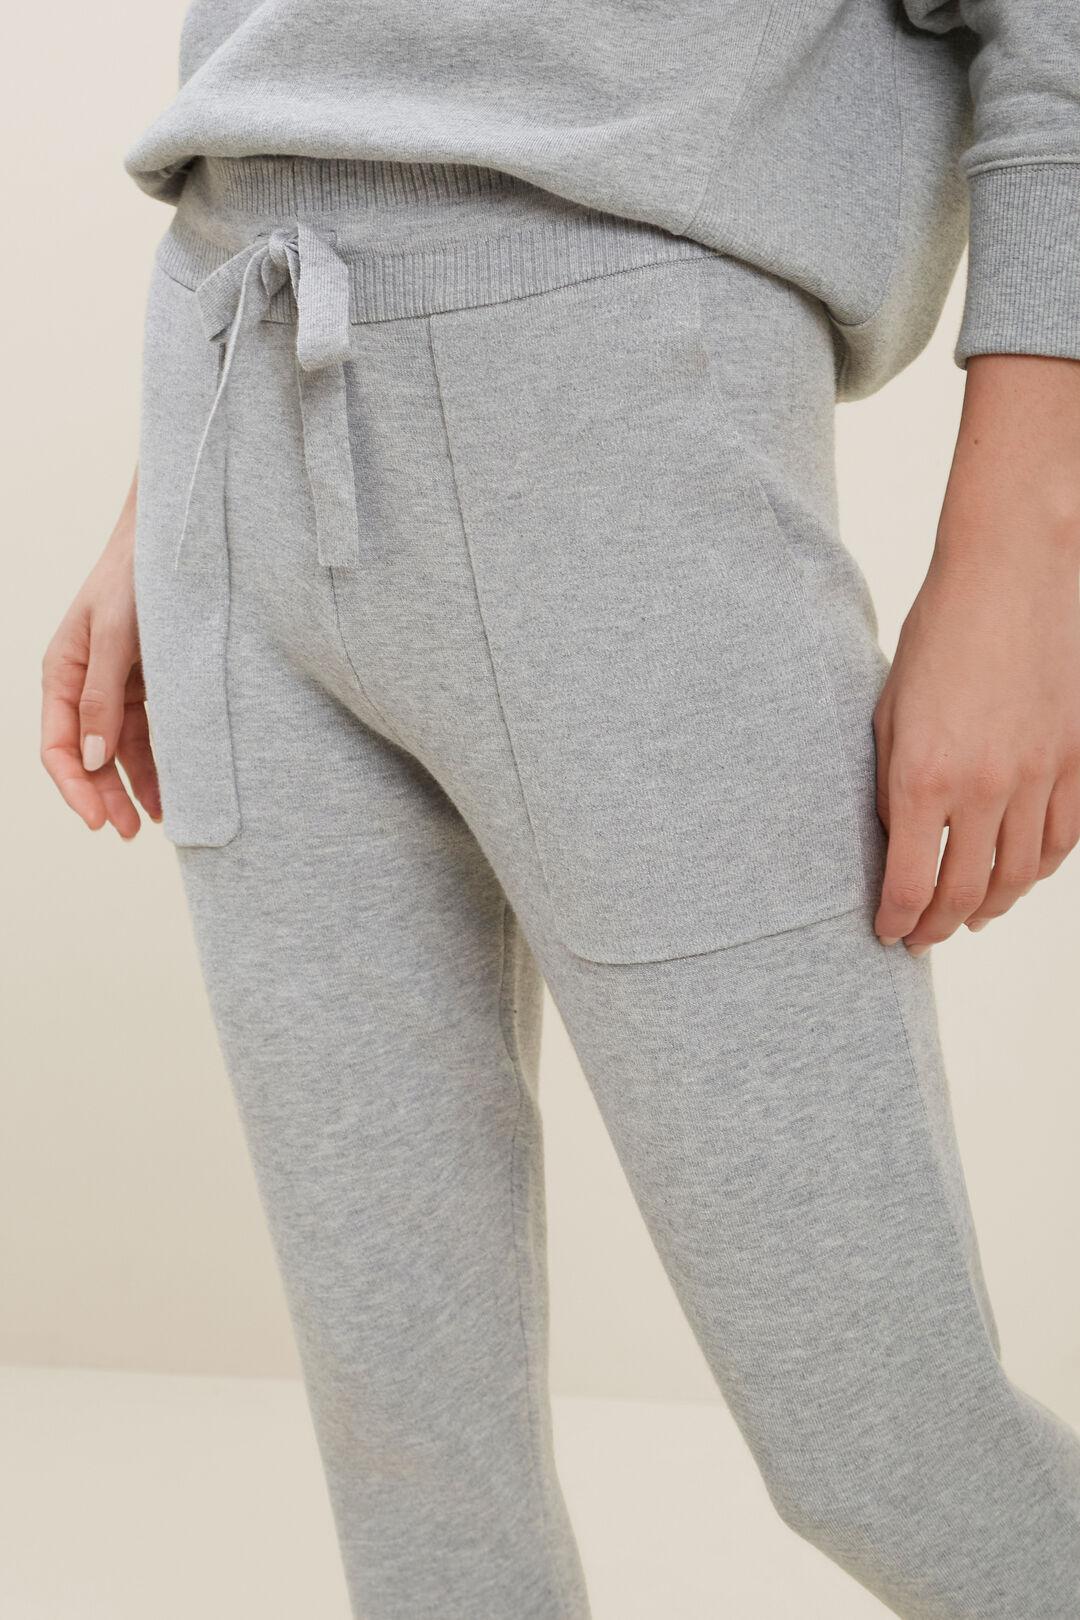 Knitted Marle Trackpants  DIM GREY MARLE  hi-res